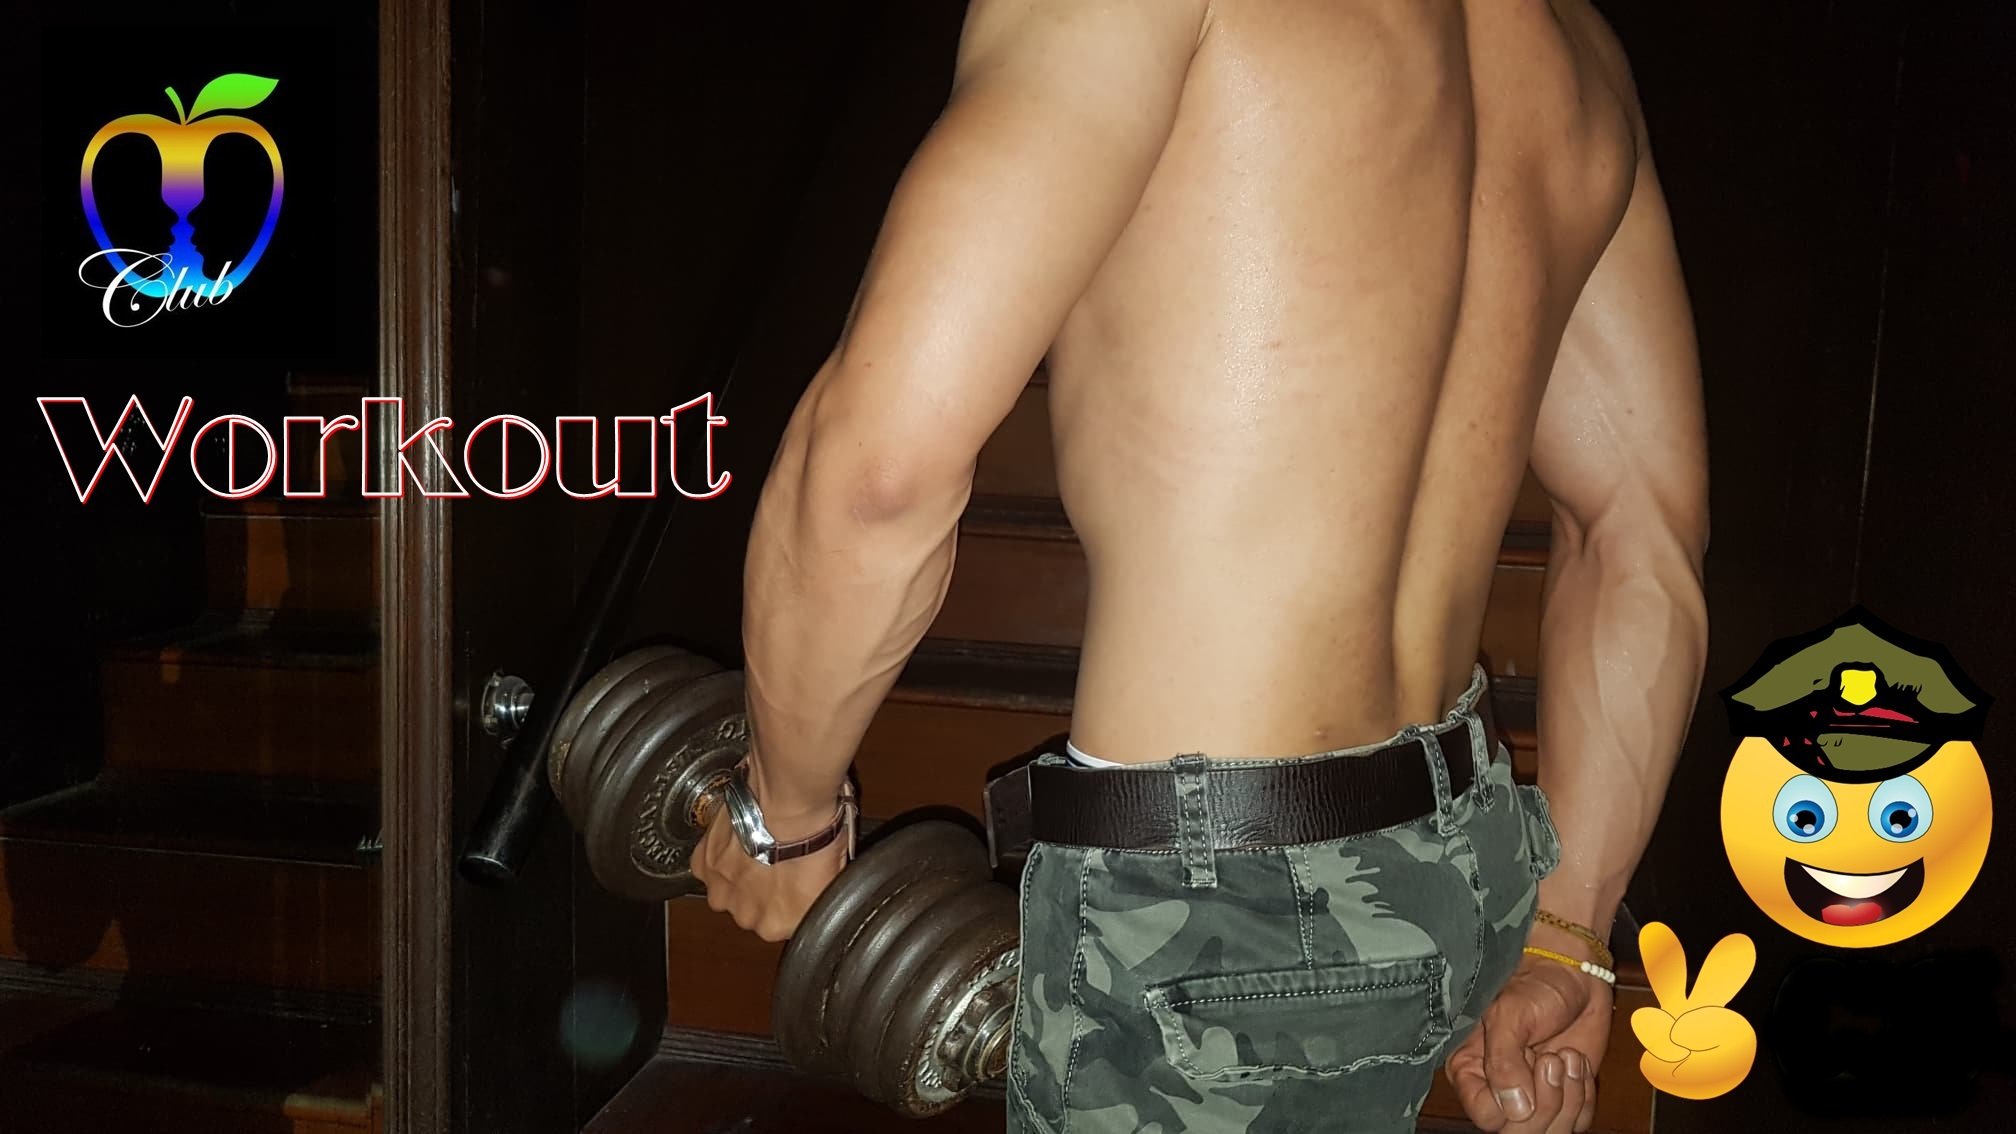 Workout Adams Apple Club CNX